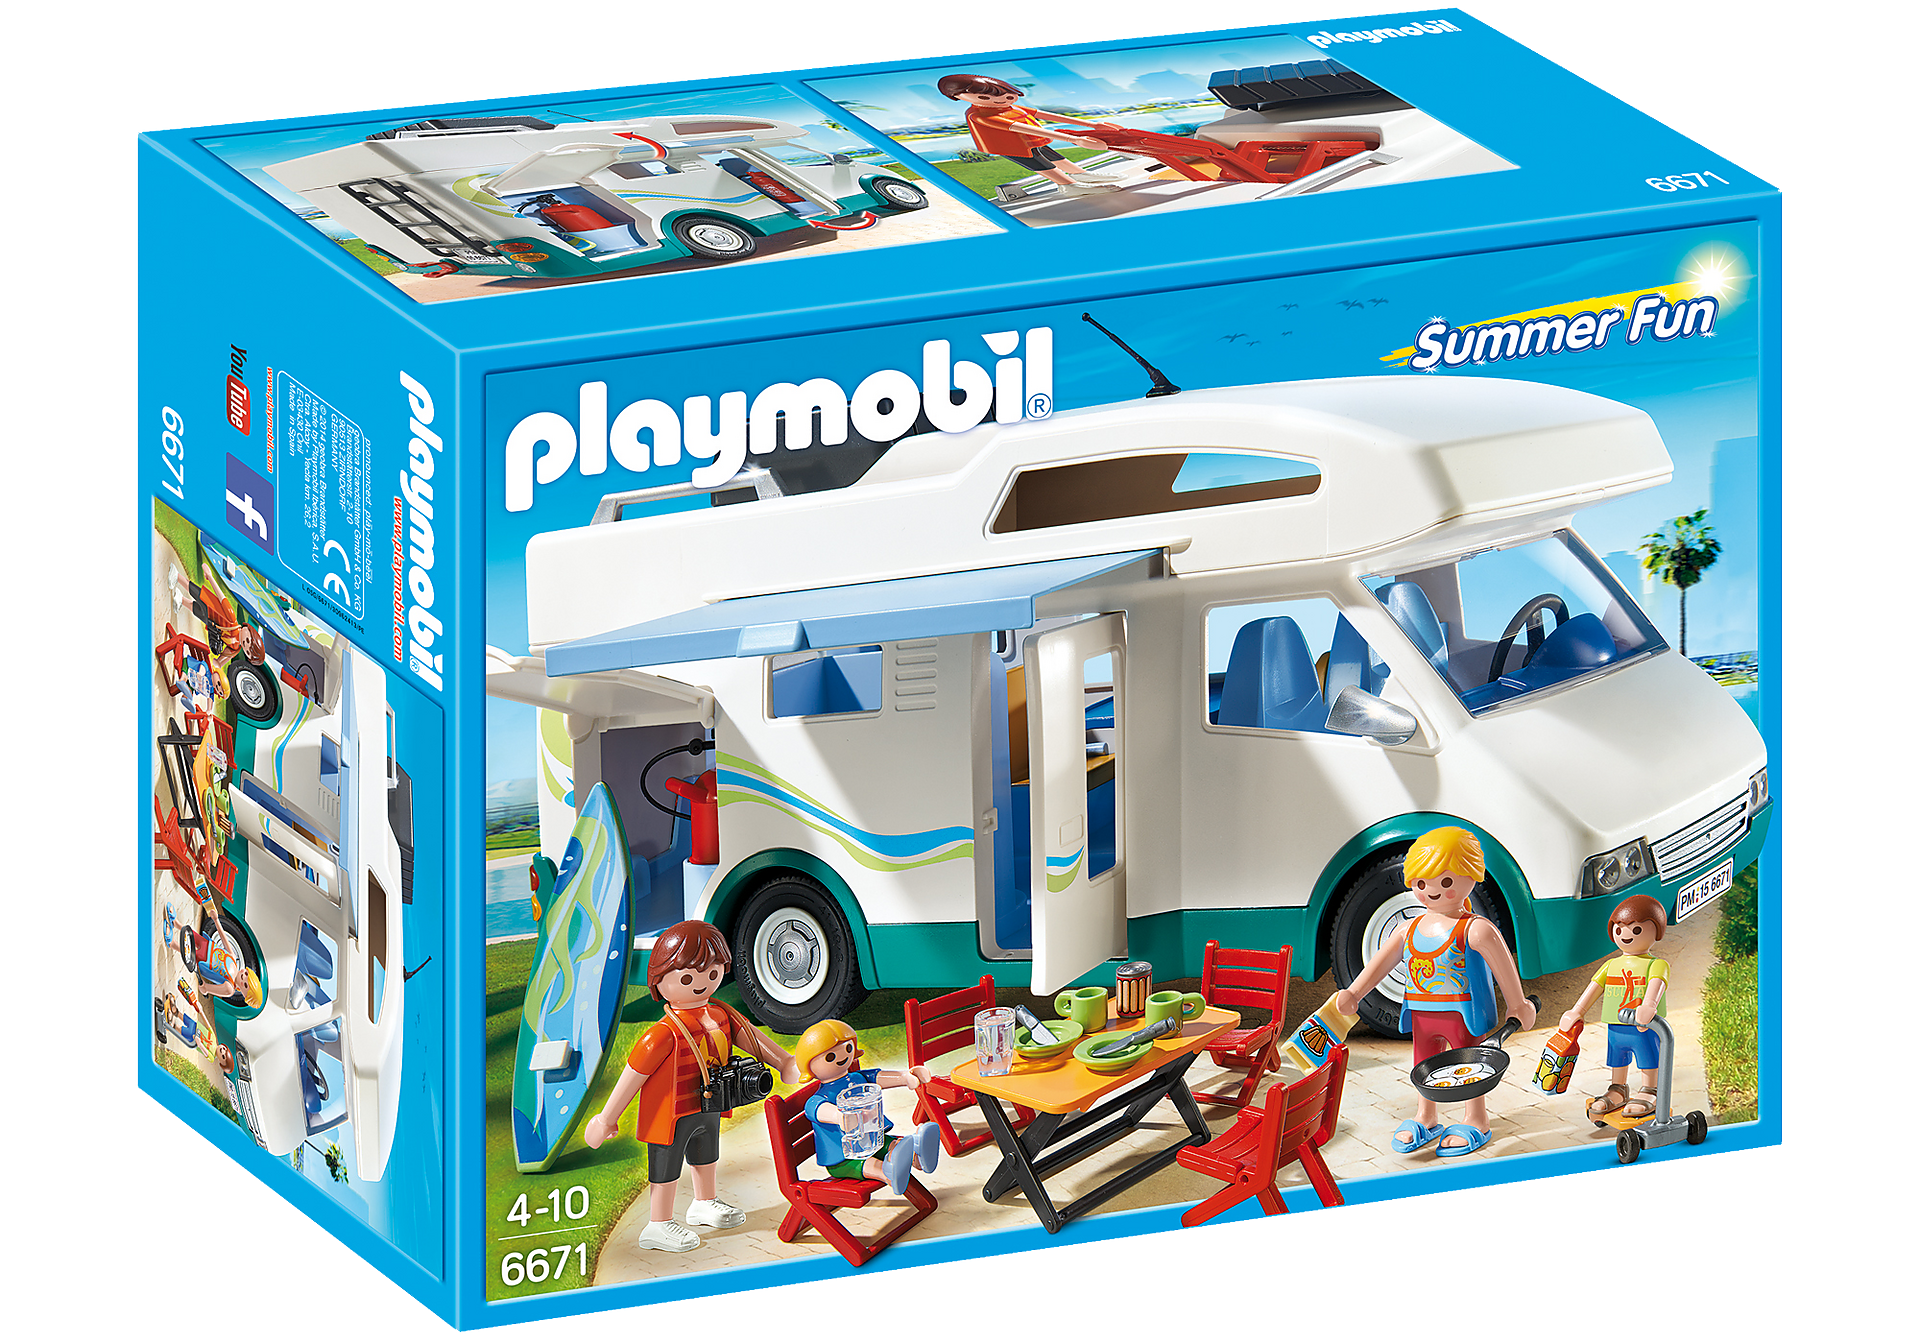 http://media.playmobil.com/i/playmobil/6671_product_box_front/Summer Camper